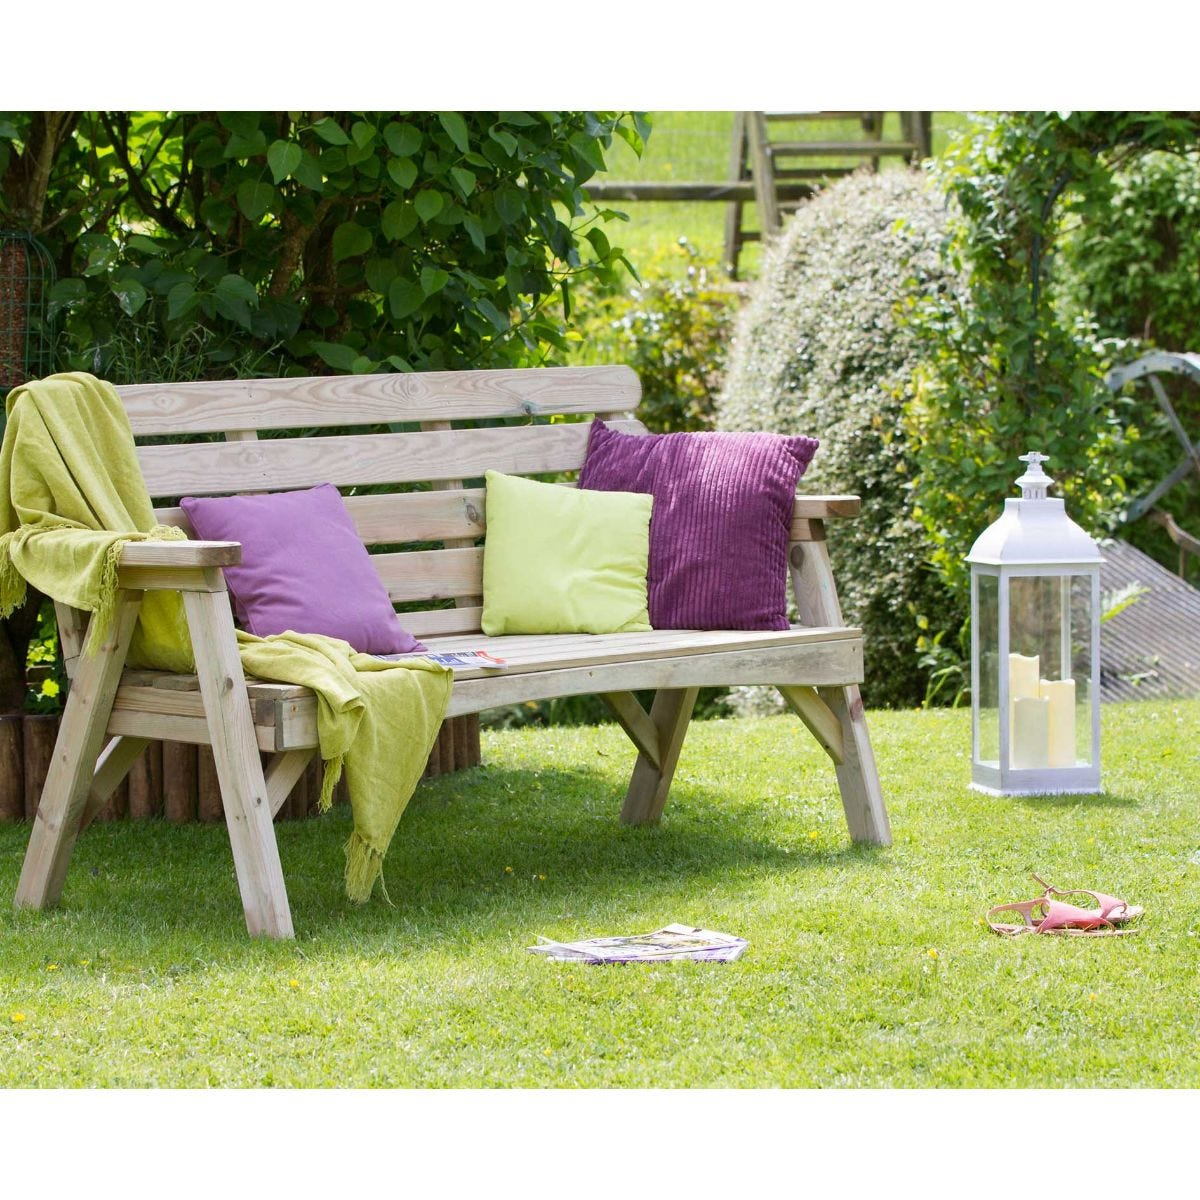 Abbey 3 Seater Garden Bench